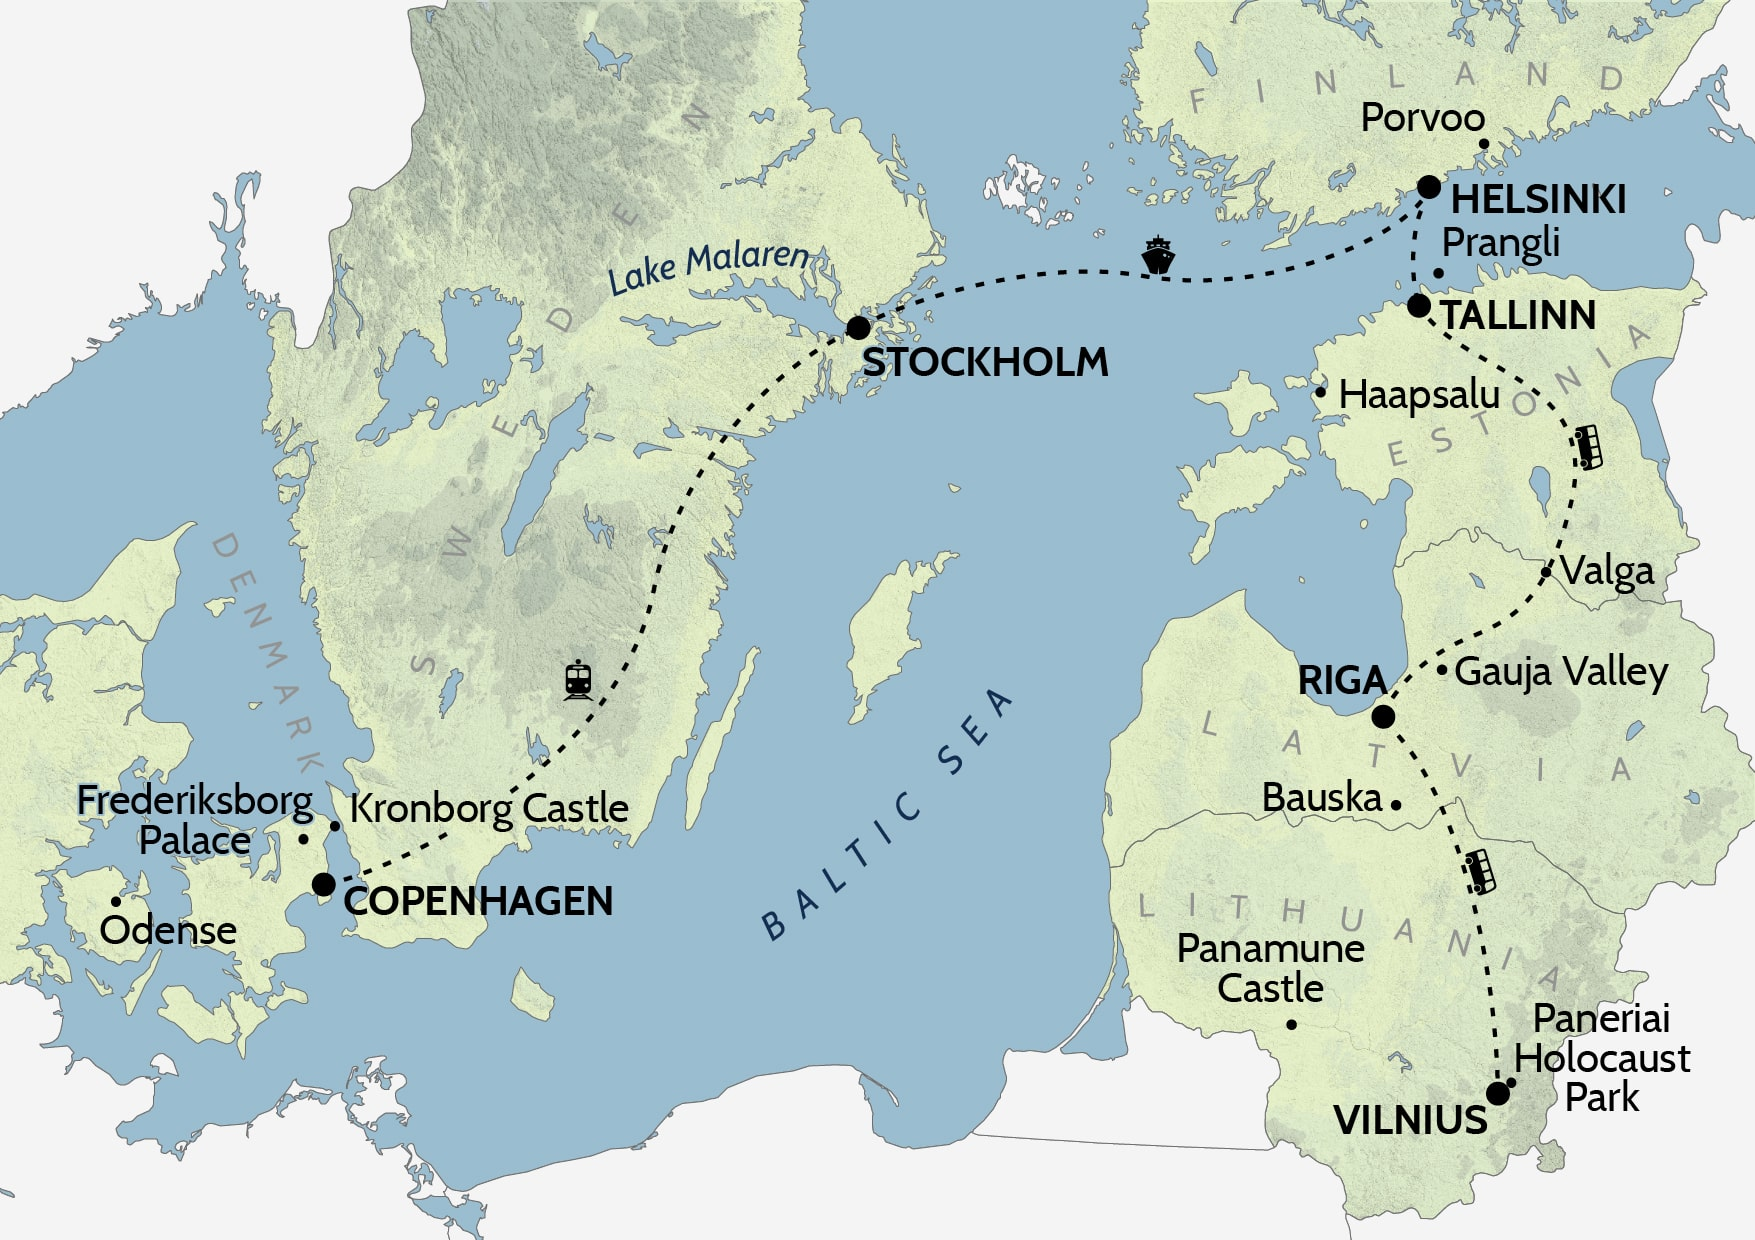 5x5_Scandinavia_map-01 (1)-min